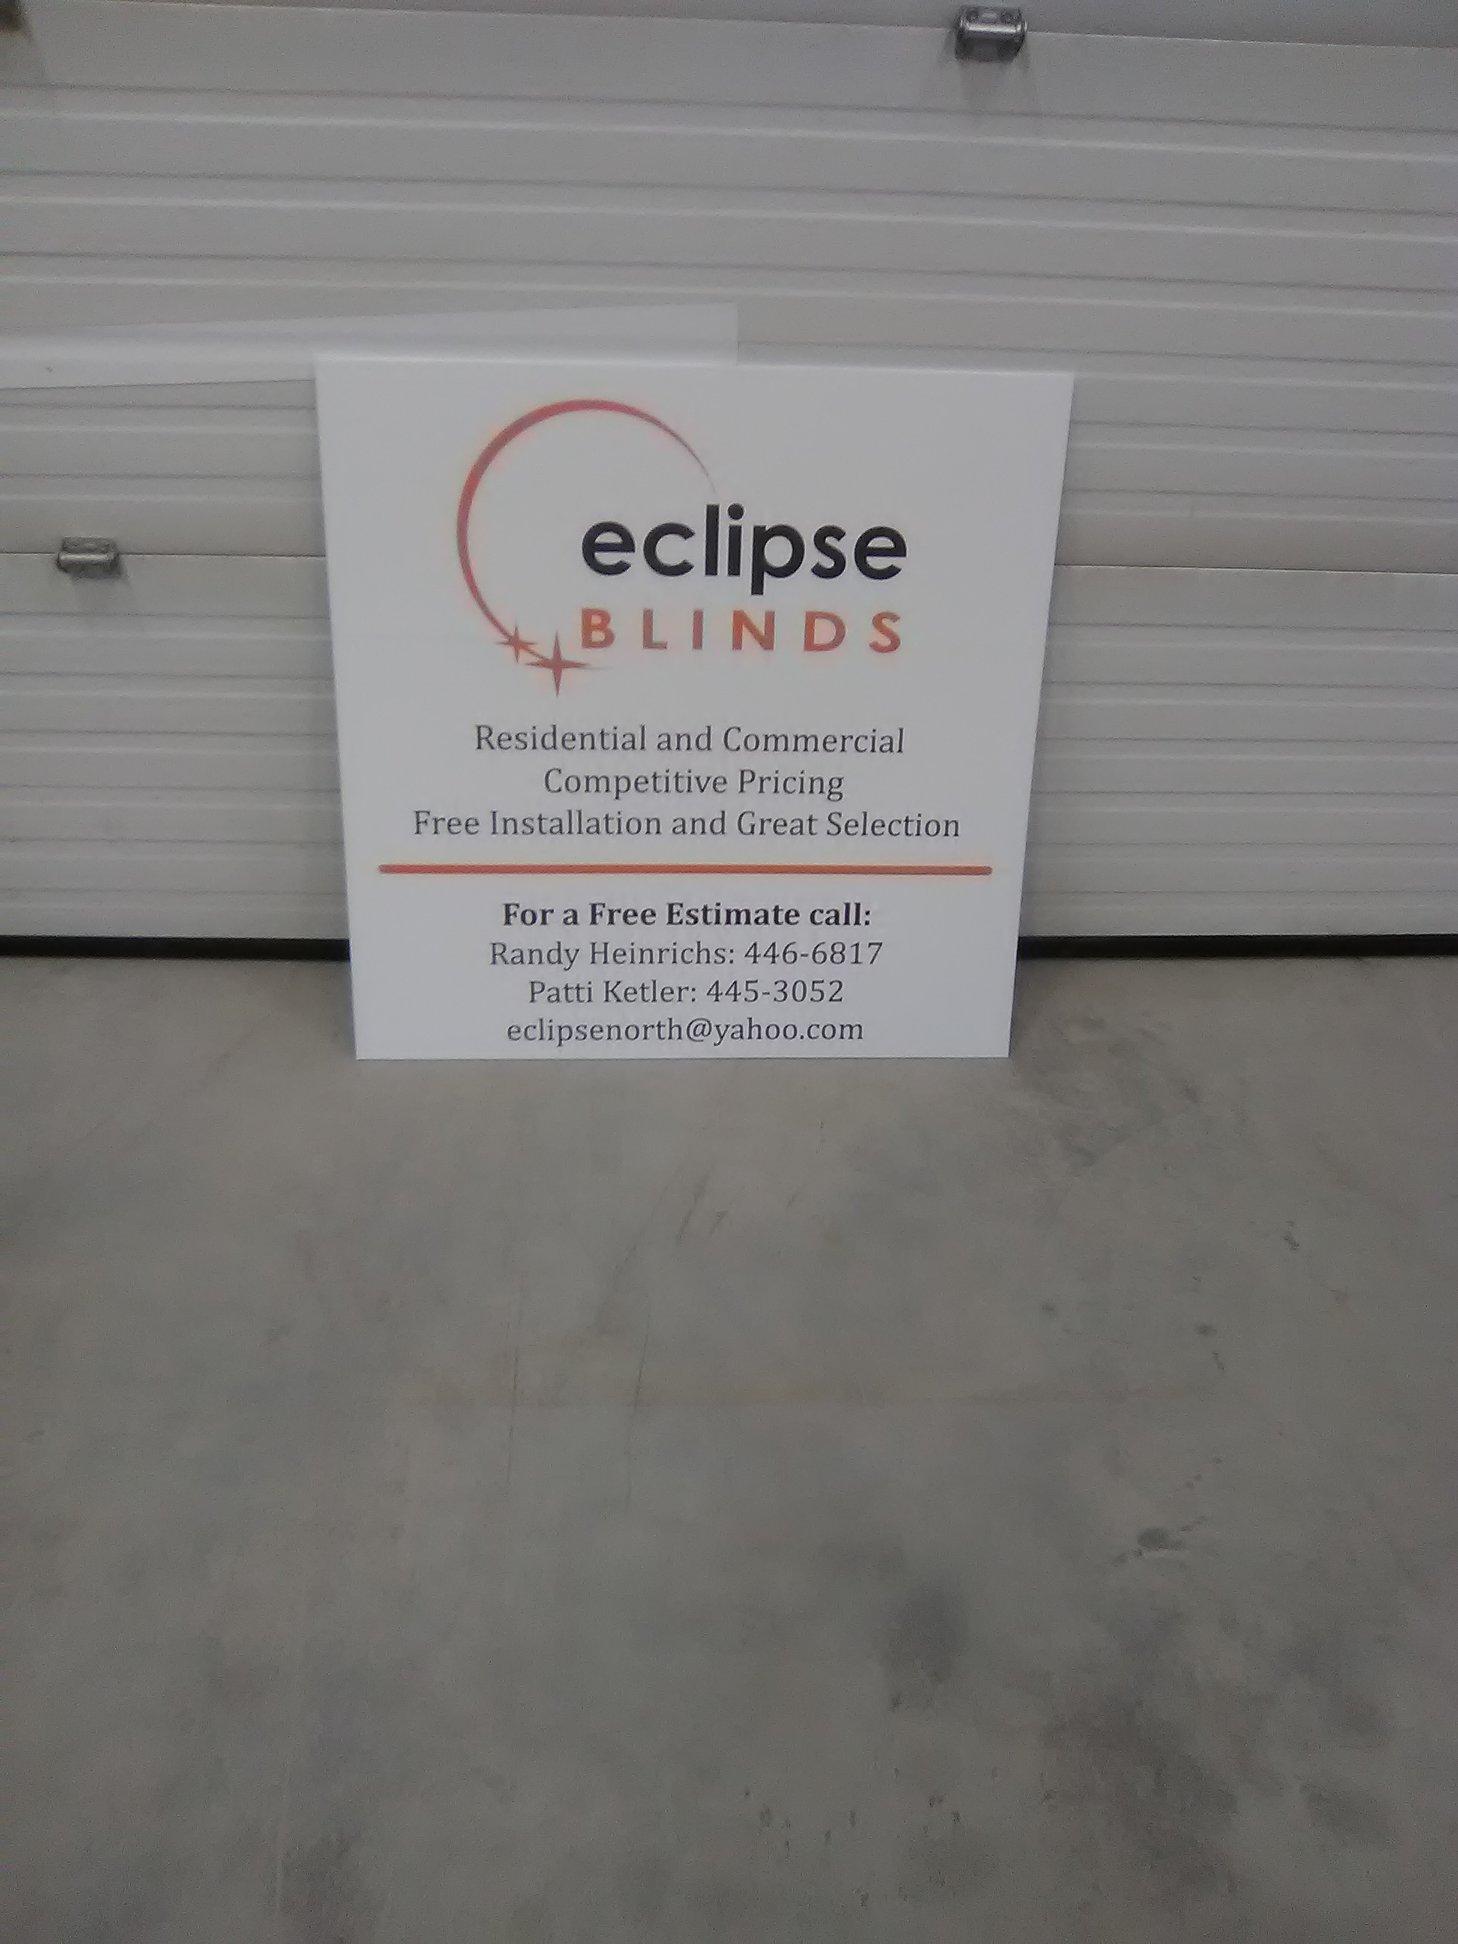 Eclipse Blinds Exterior Signage